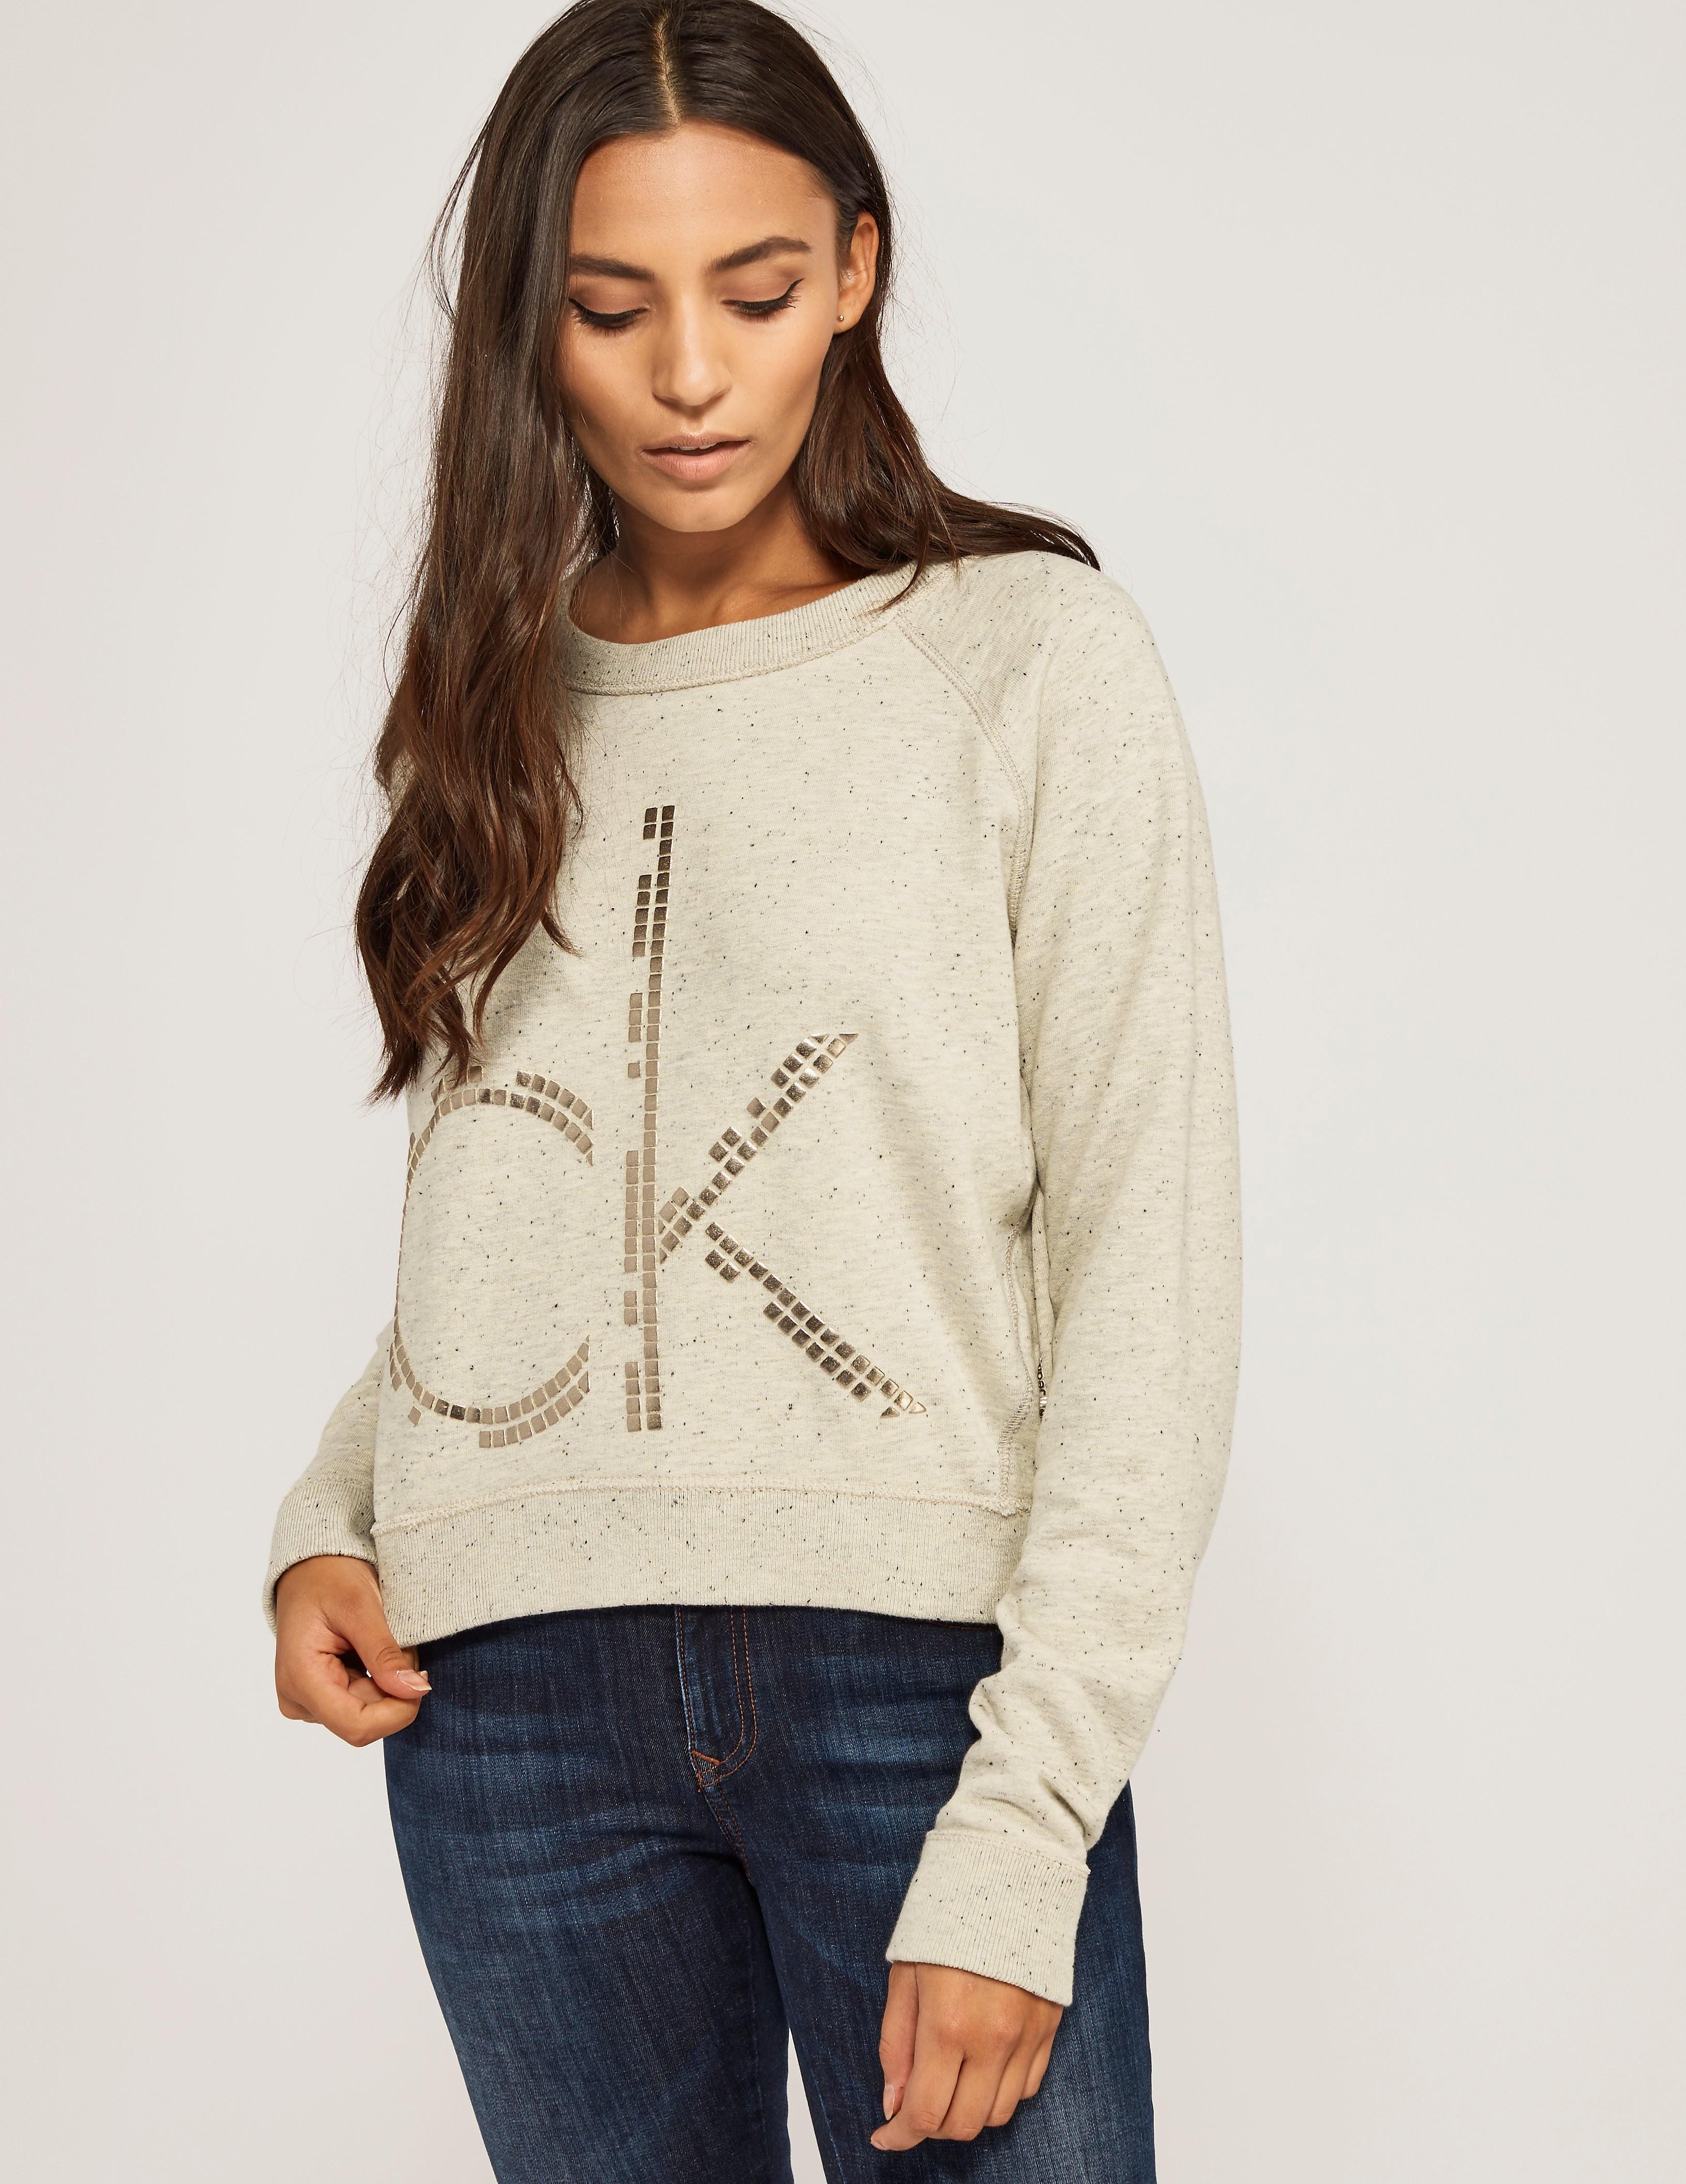 Calvin Klein Jesa Logo Stud Crew Sweatshirt